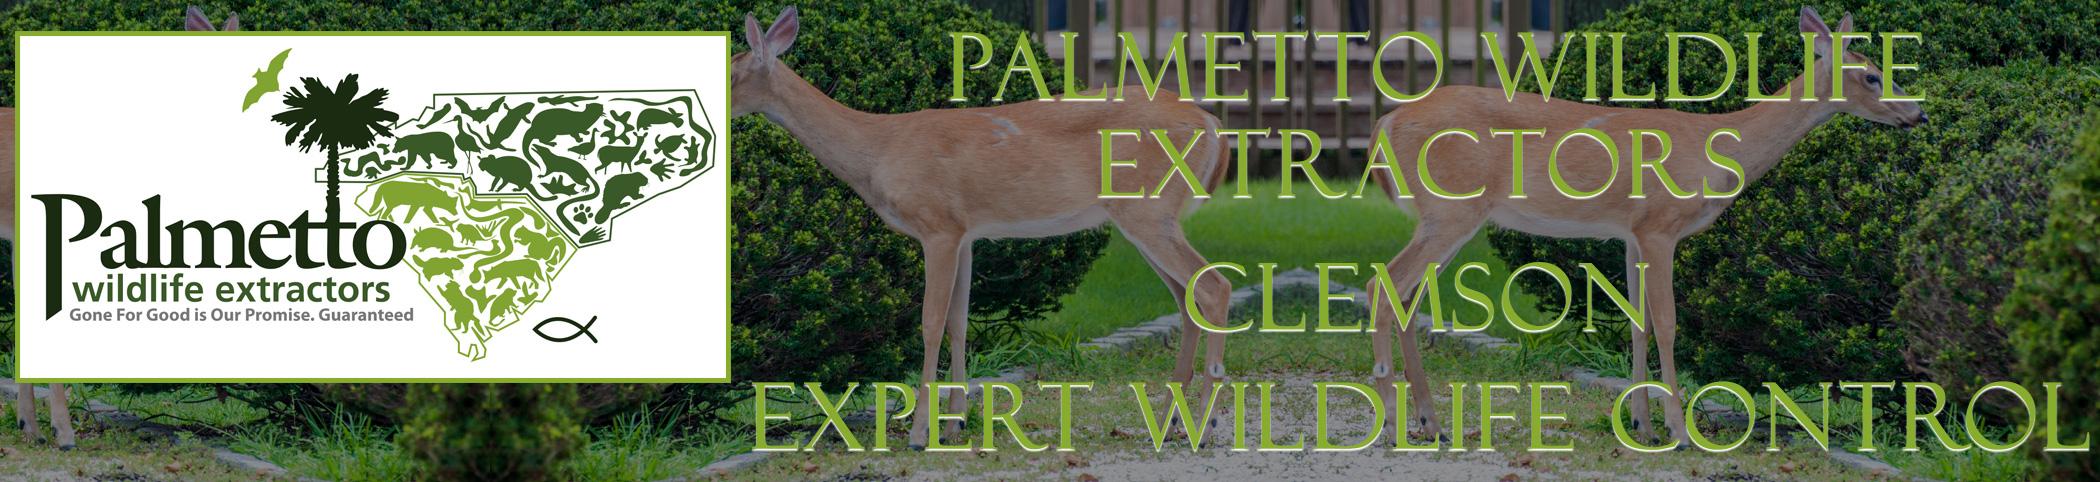 Palmetto Wildlife Extractors Clemson South Carolina header image